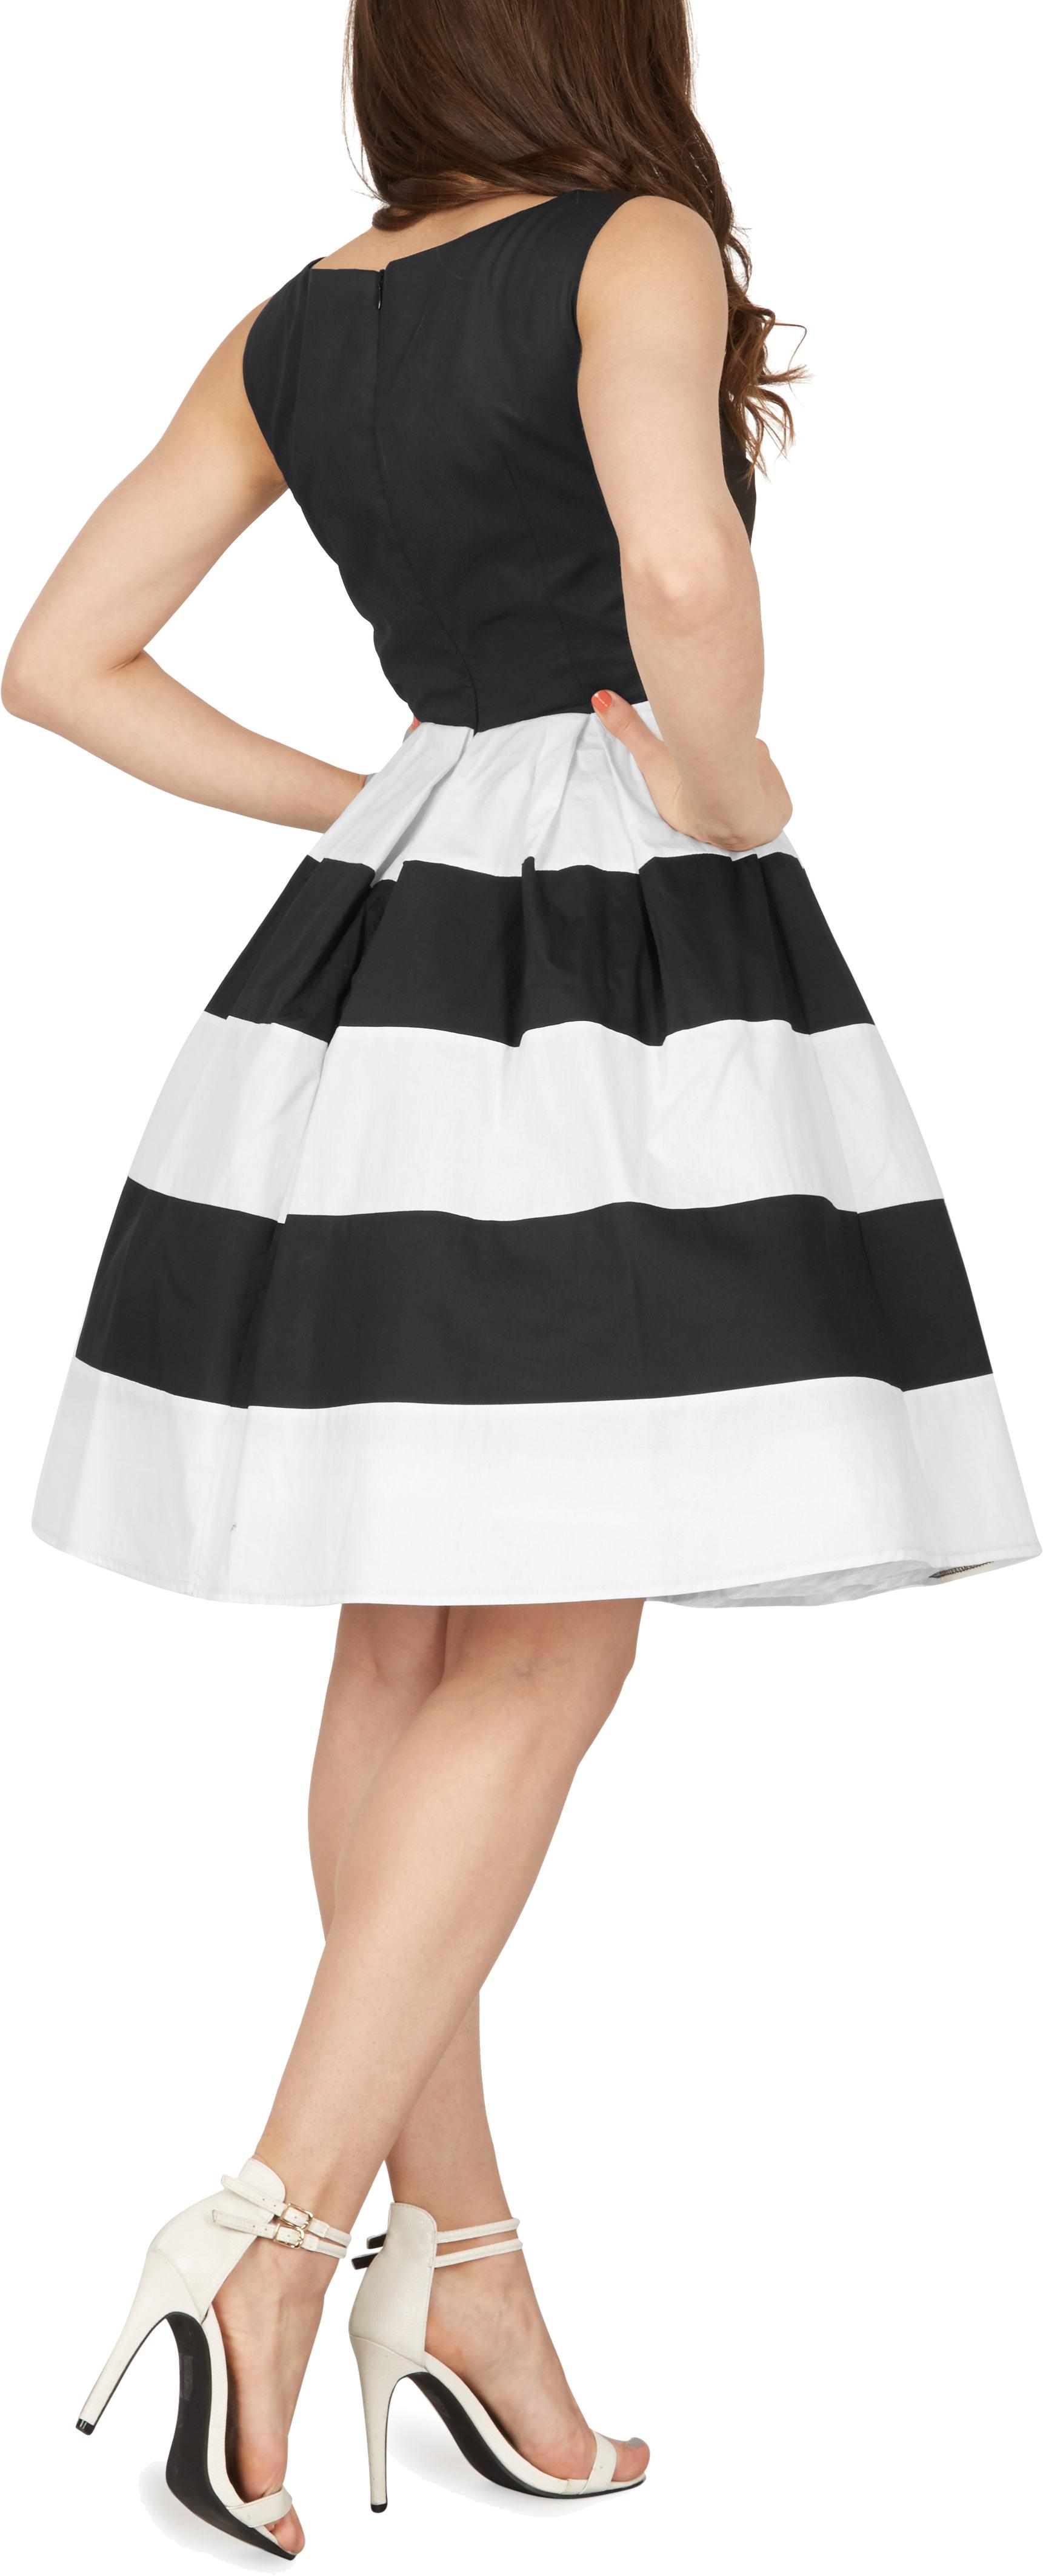 Rockabilly Nero Swing Up Prom Vintage Pin Dress 'lilly' 50's Striped Blackbutterfly fvYRRq